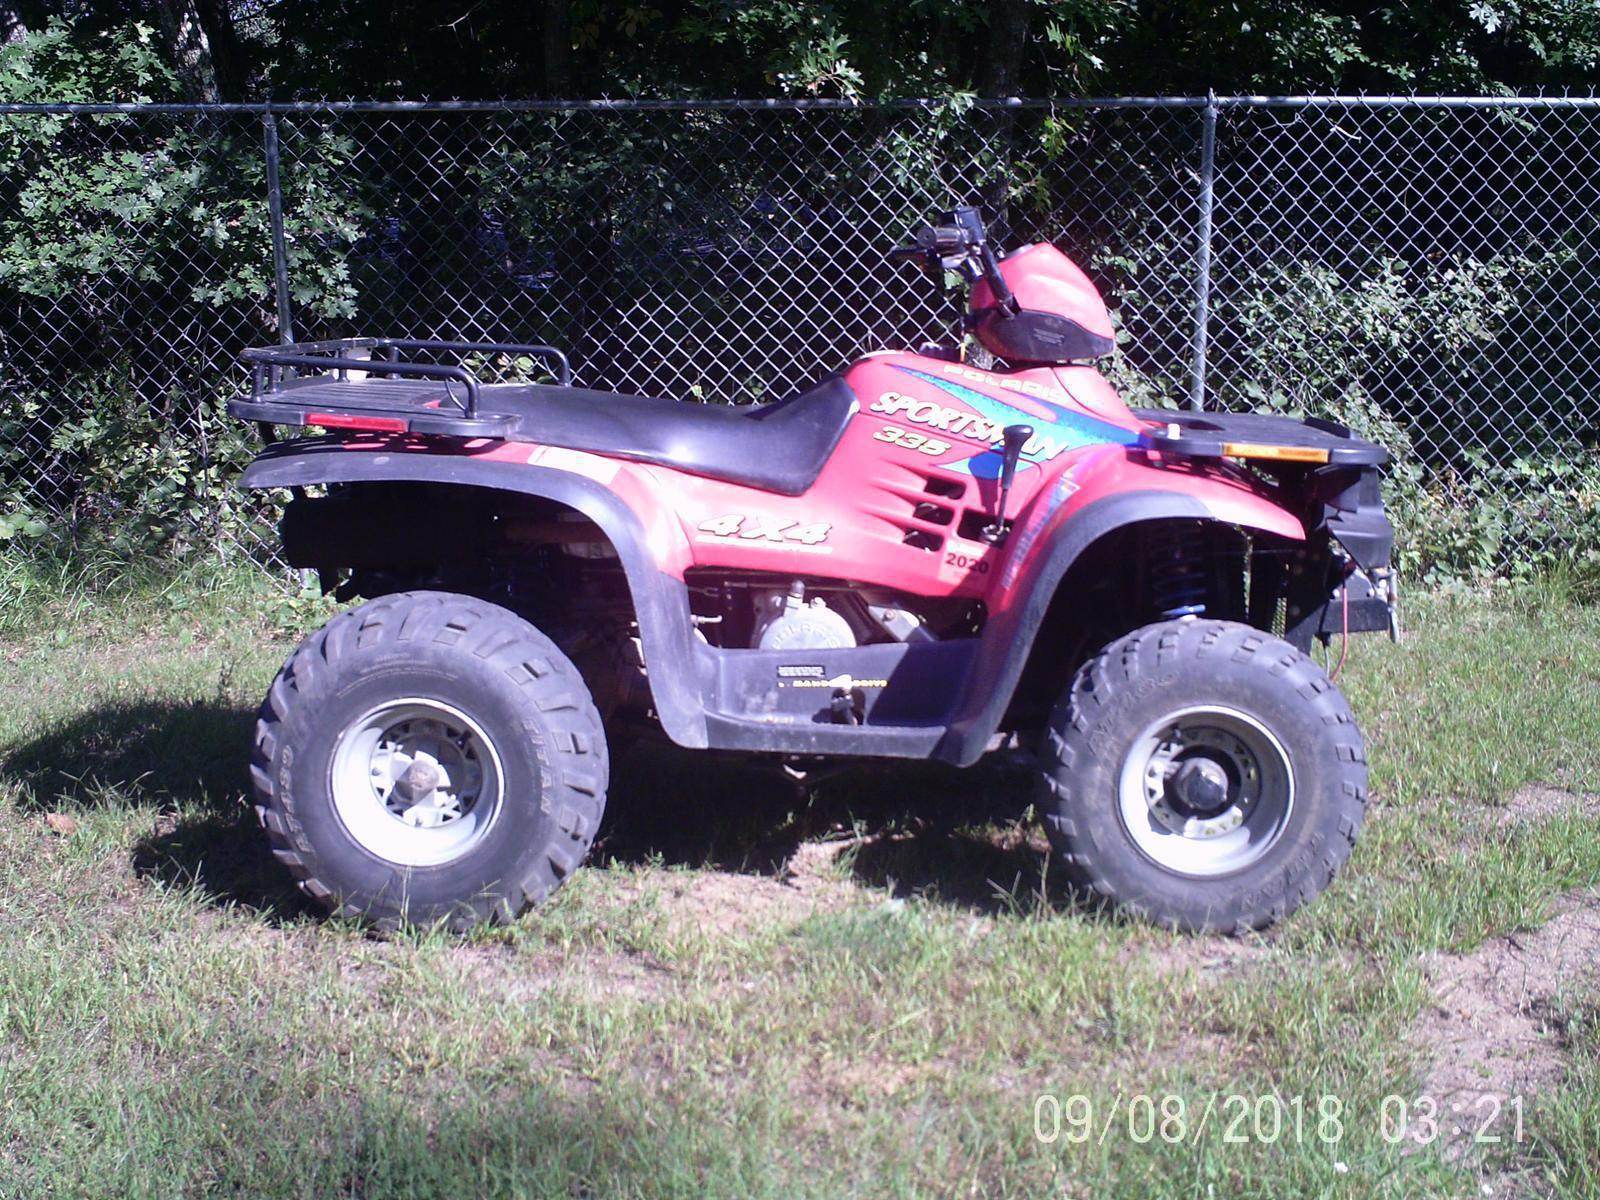 Used ATV'S from Polaris FOUR STAR SPORTS WEBB LAKE, WI (715